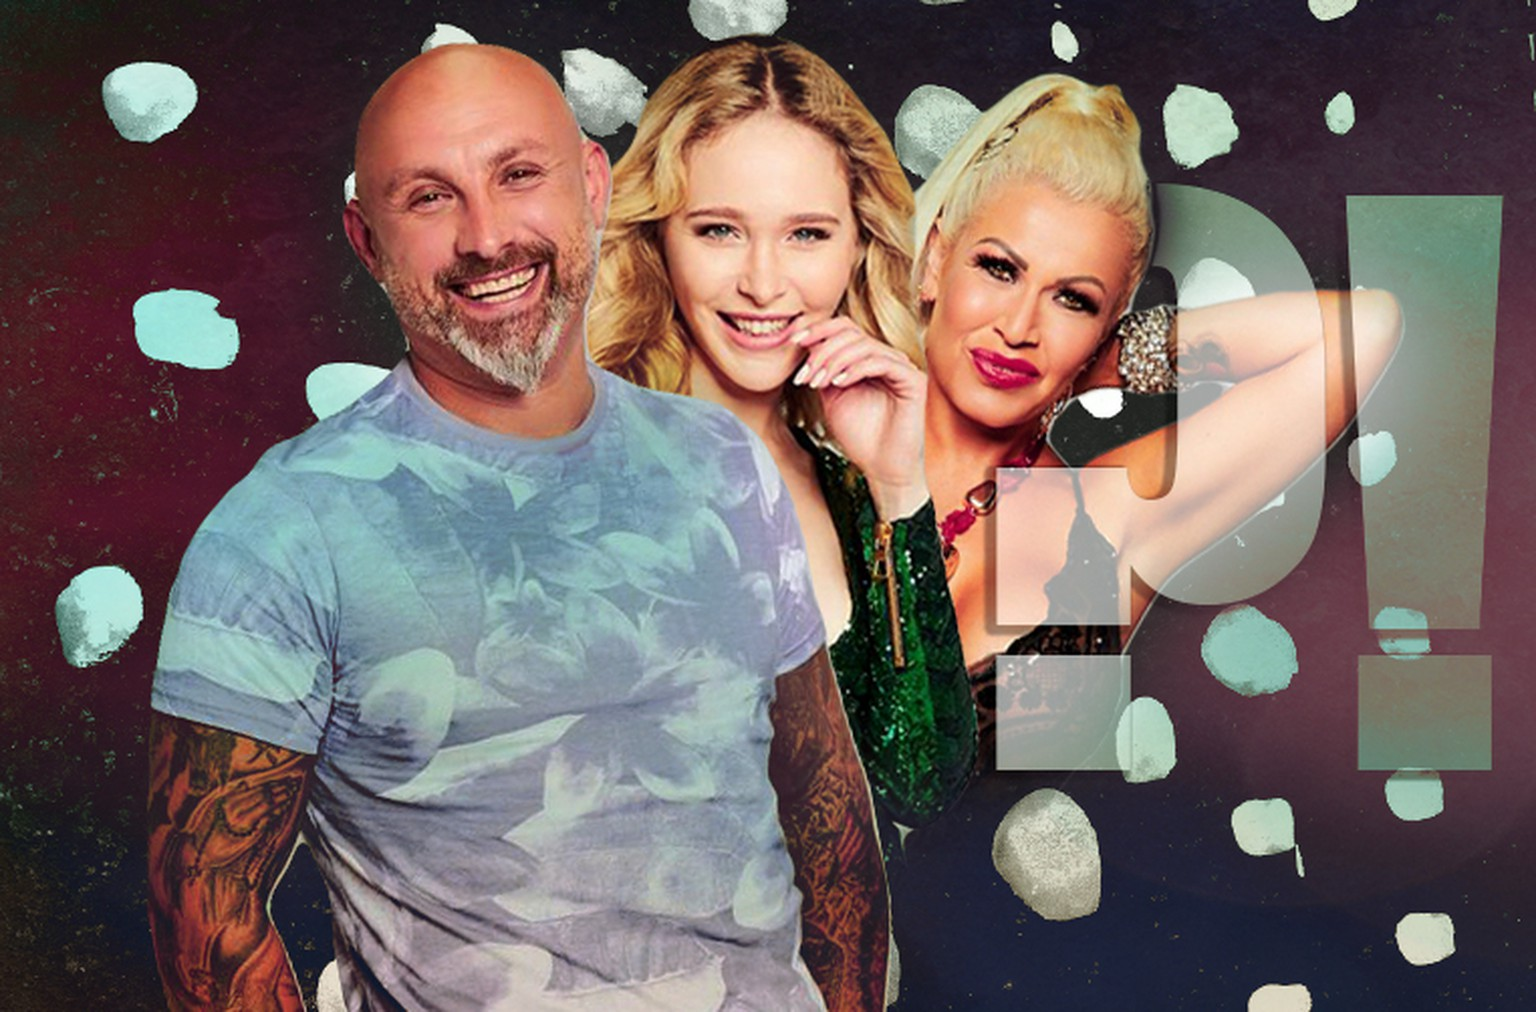 Promi Big Brother 2021 Folge 3